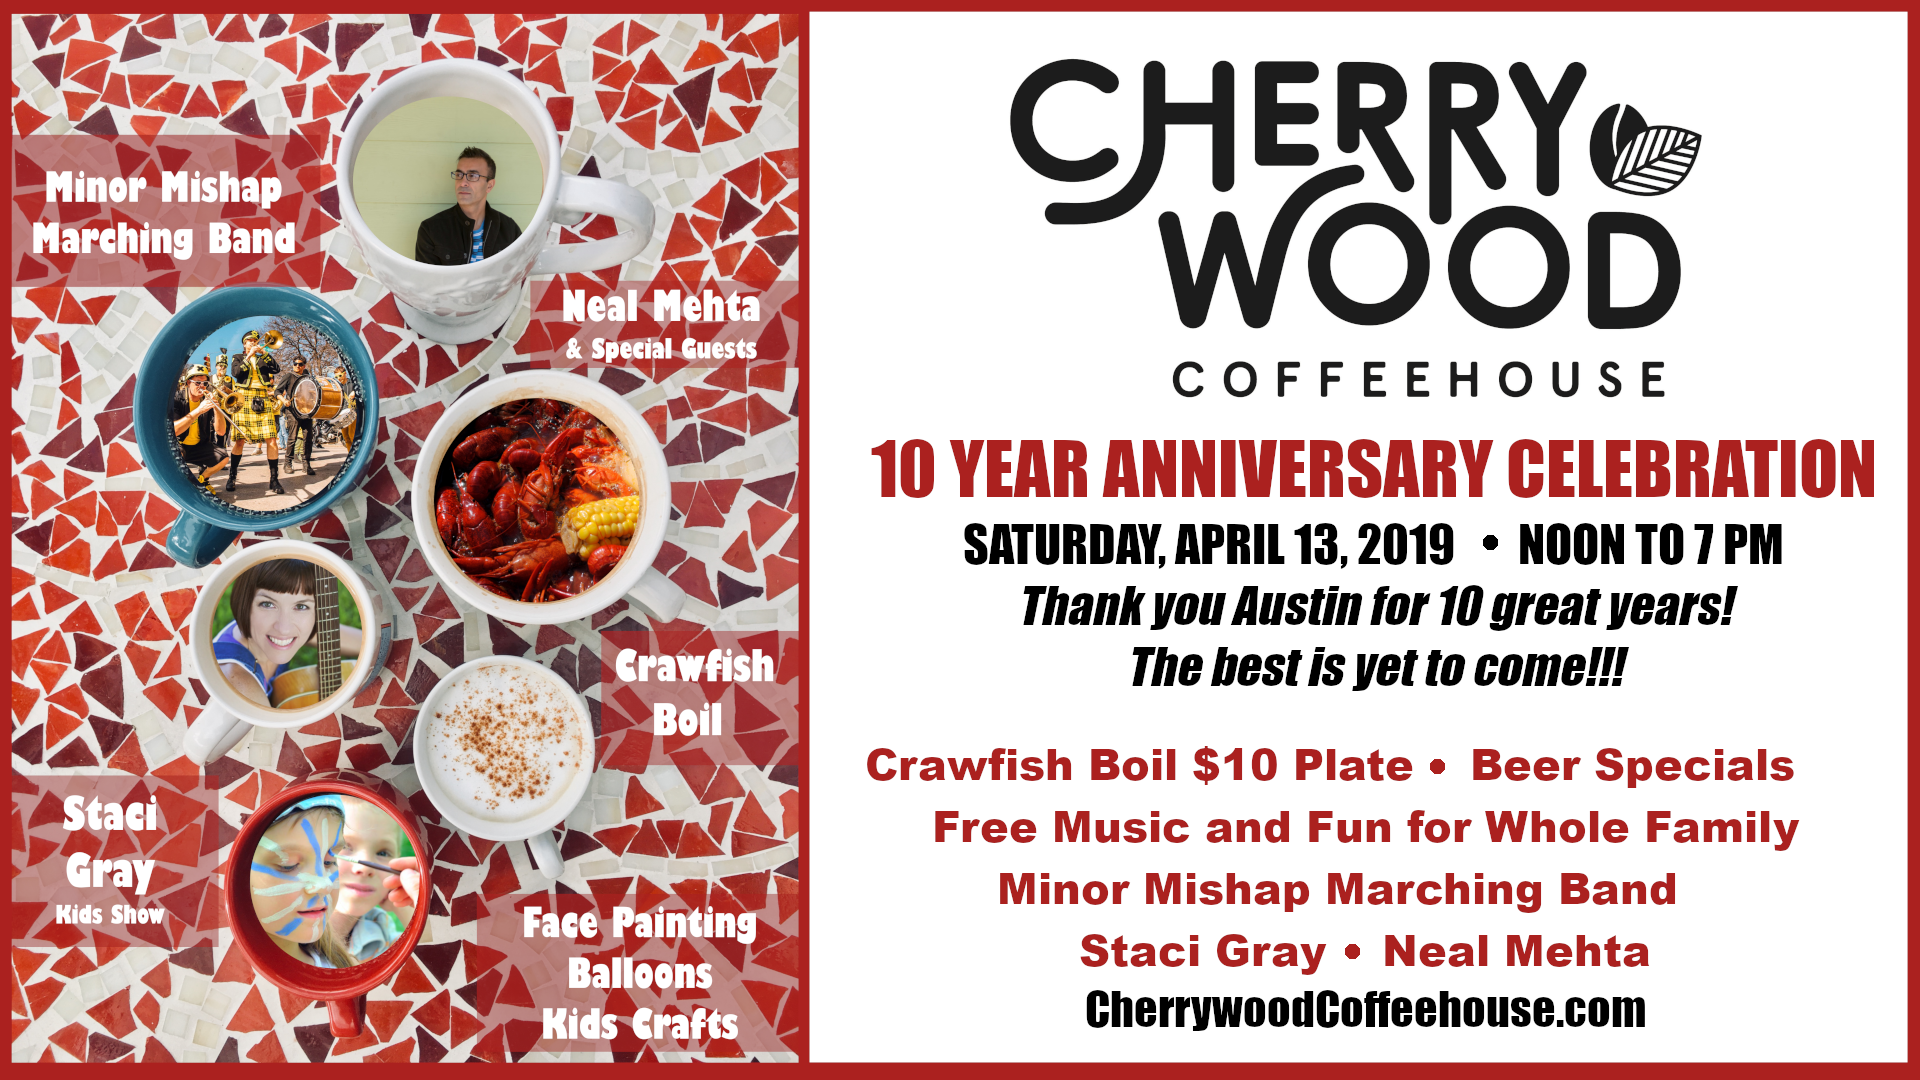 Cherrywood 10 Year Anniversary April 13 2019